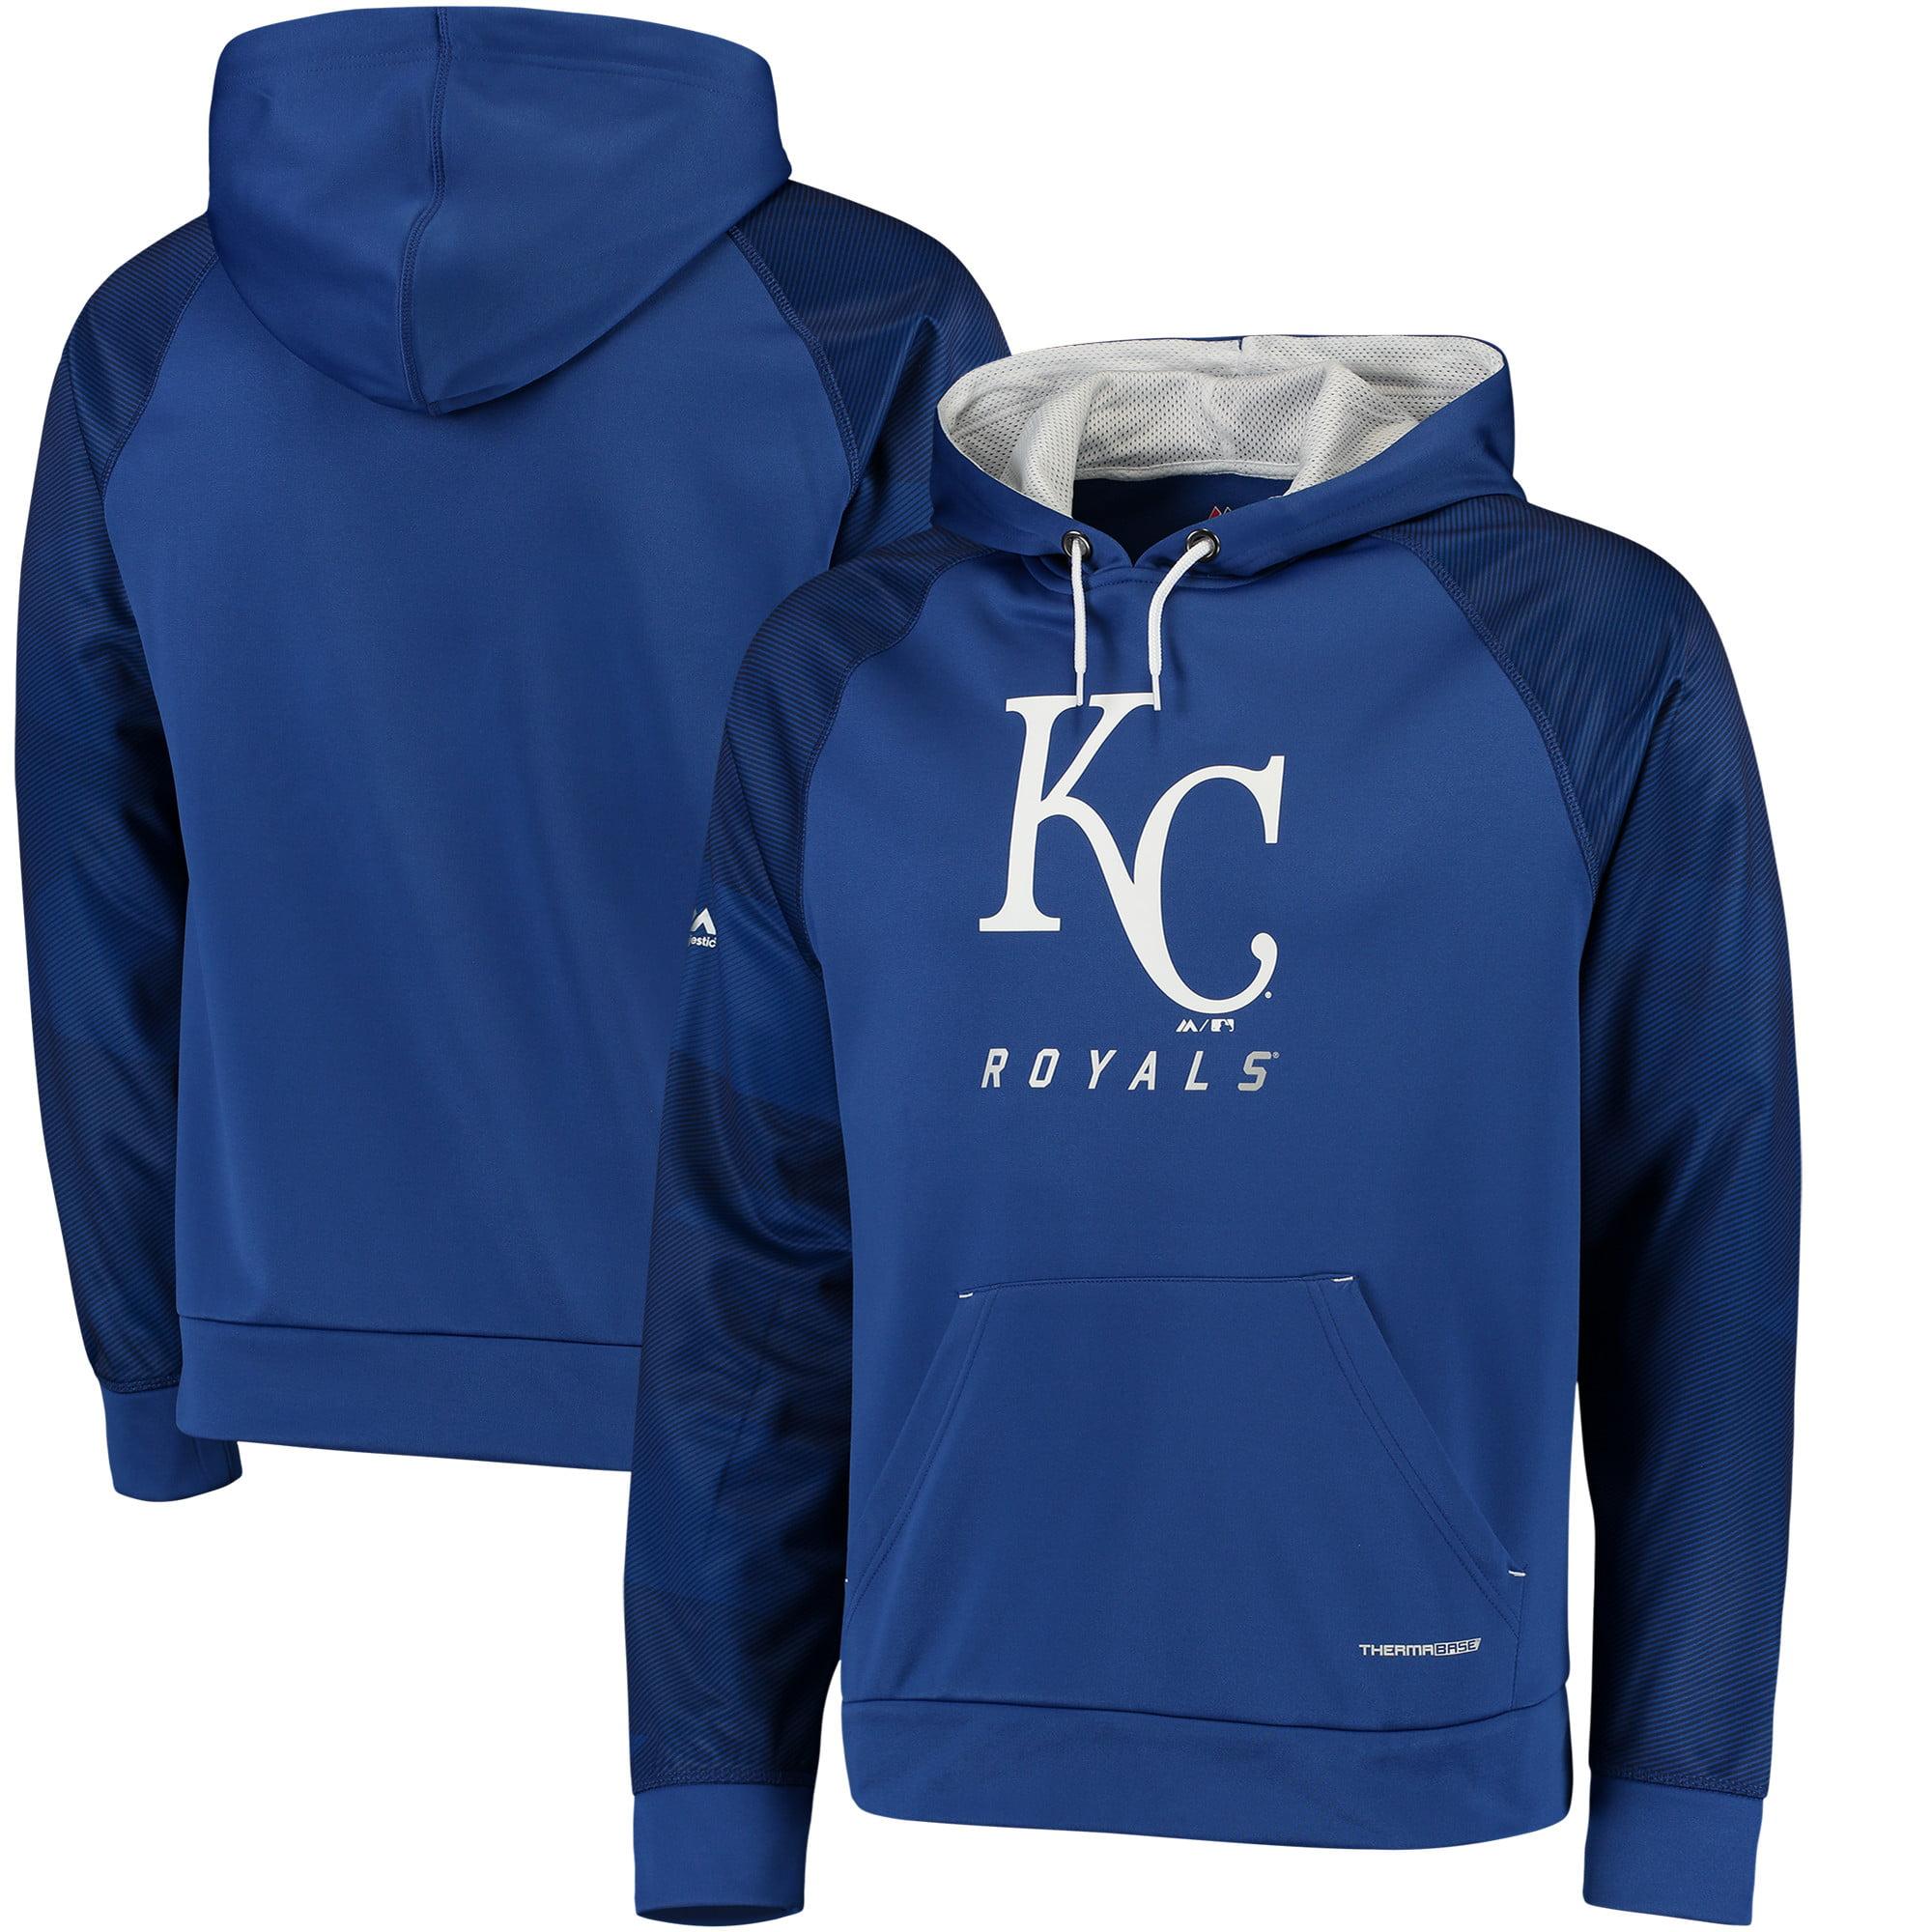 "Kansas City Royals Majestic MLB ""Armor 2"" Men's Pullover Hooded Sweatshirt by MAJESTIC LSG"